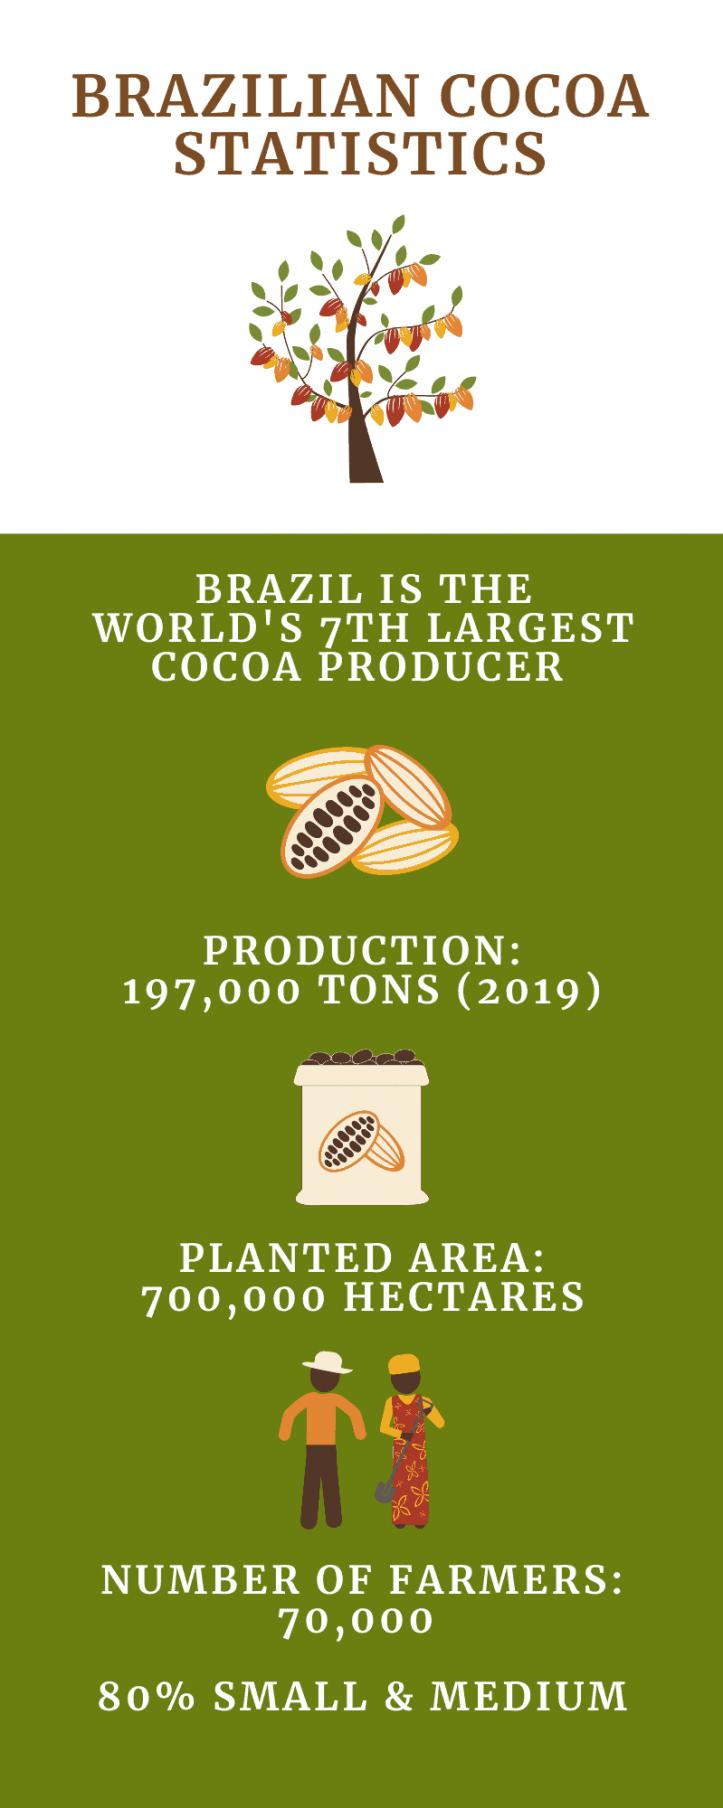 Brazil cocoa statistics, infographic